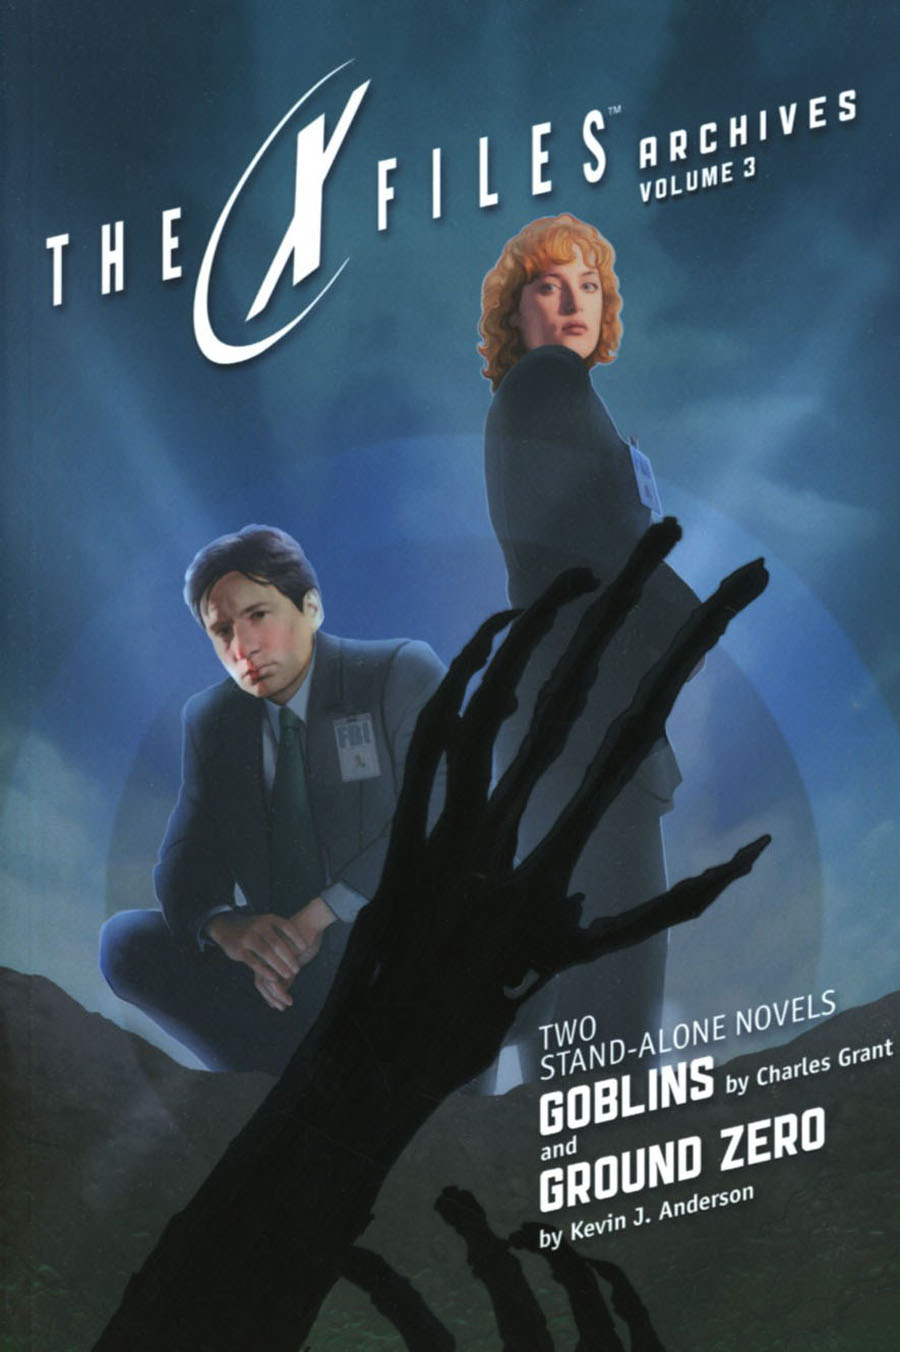 X-Files Archives Vol 3 Goblins & Ground Zero Prose Novel TP